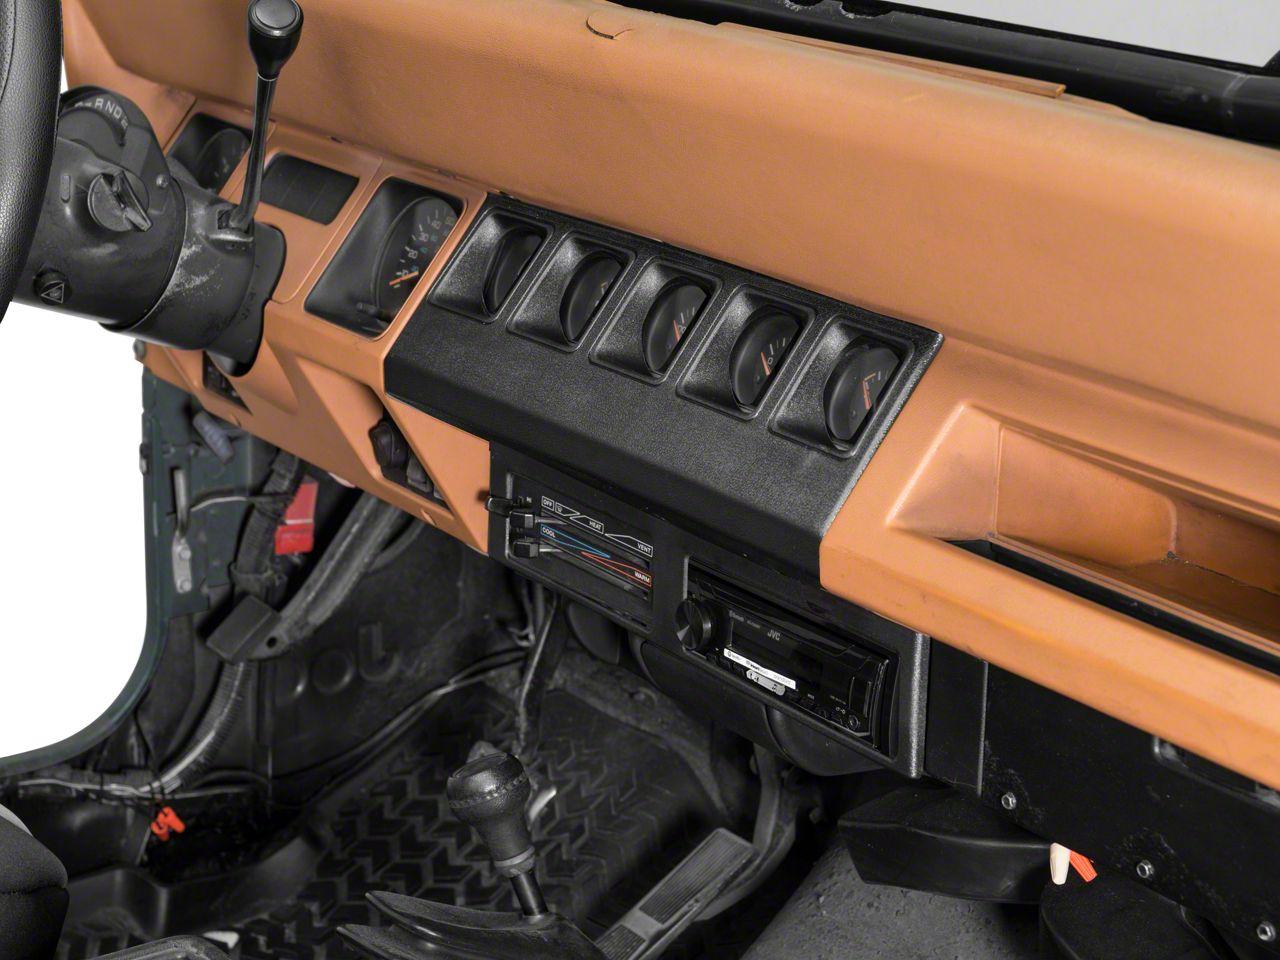 Crown Automotive Instrument Panel Housing - Black (91-95 Jeep Wrangler YJ)